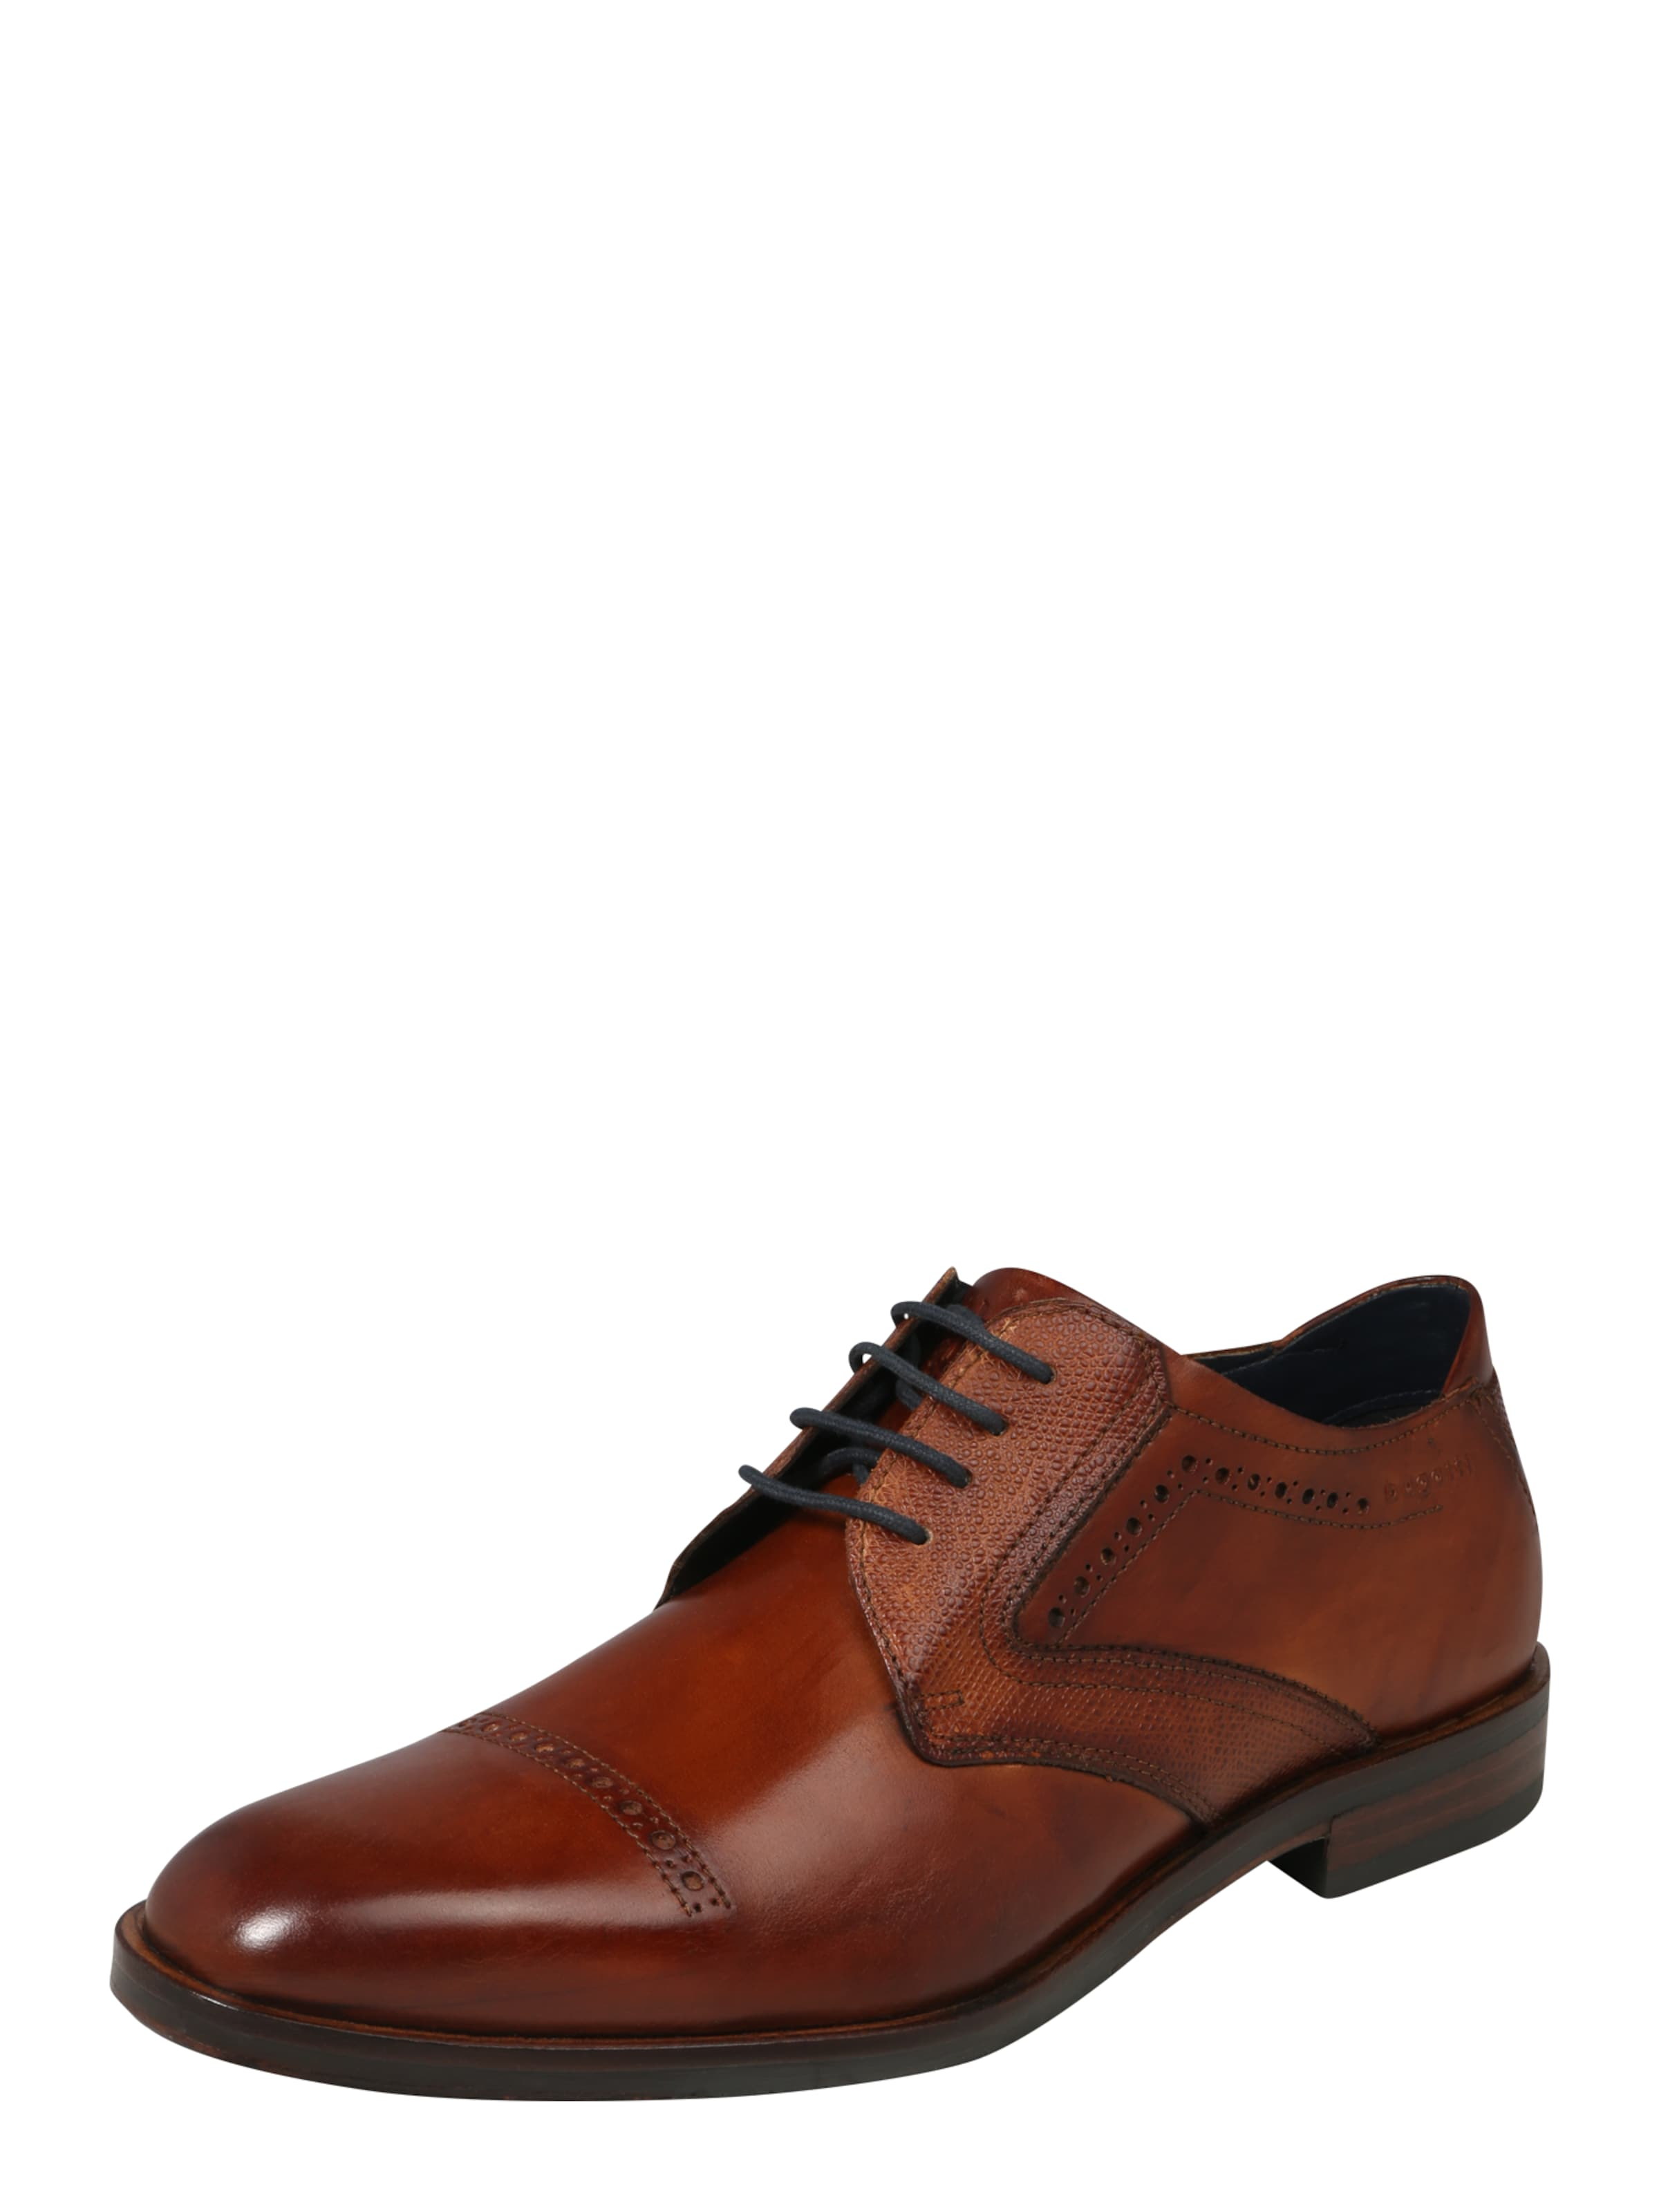 Haltbare Mode billige Schuhe bugatti   Derby 'Rainel Evo' Schuhe Gut getragene Schuhe